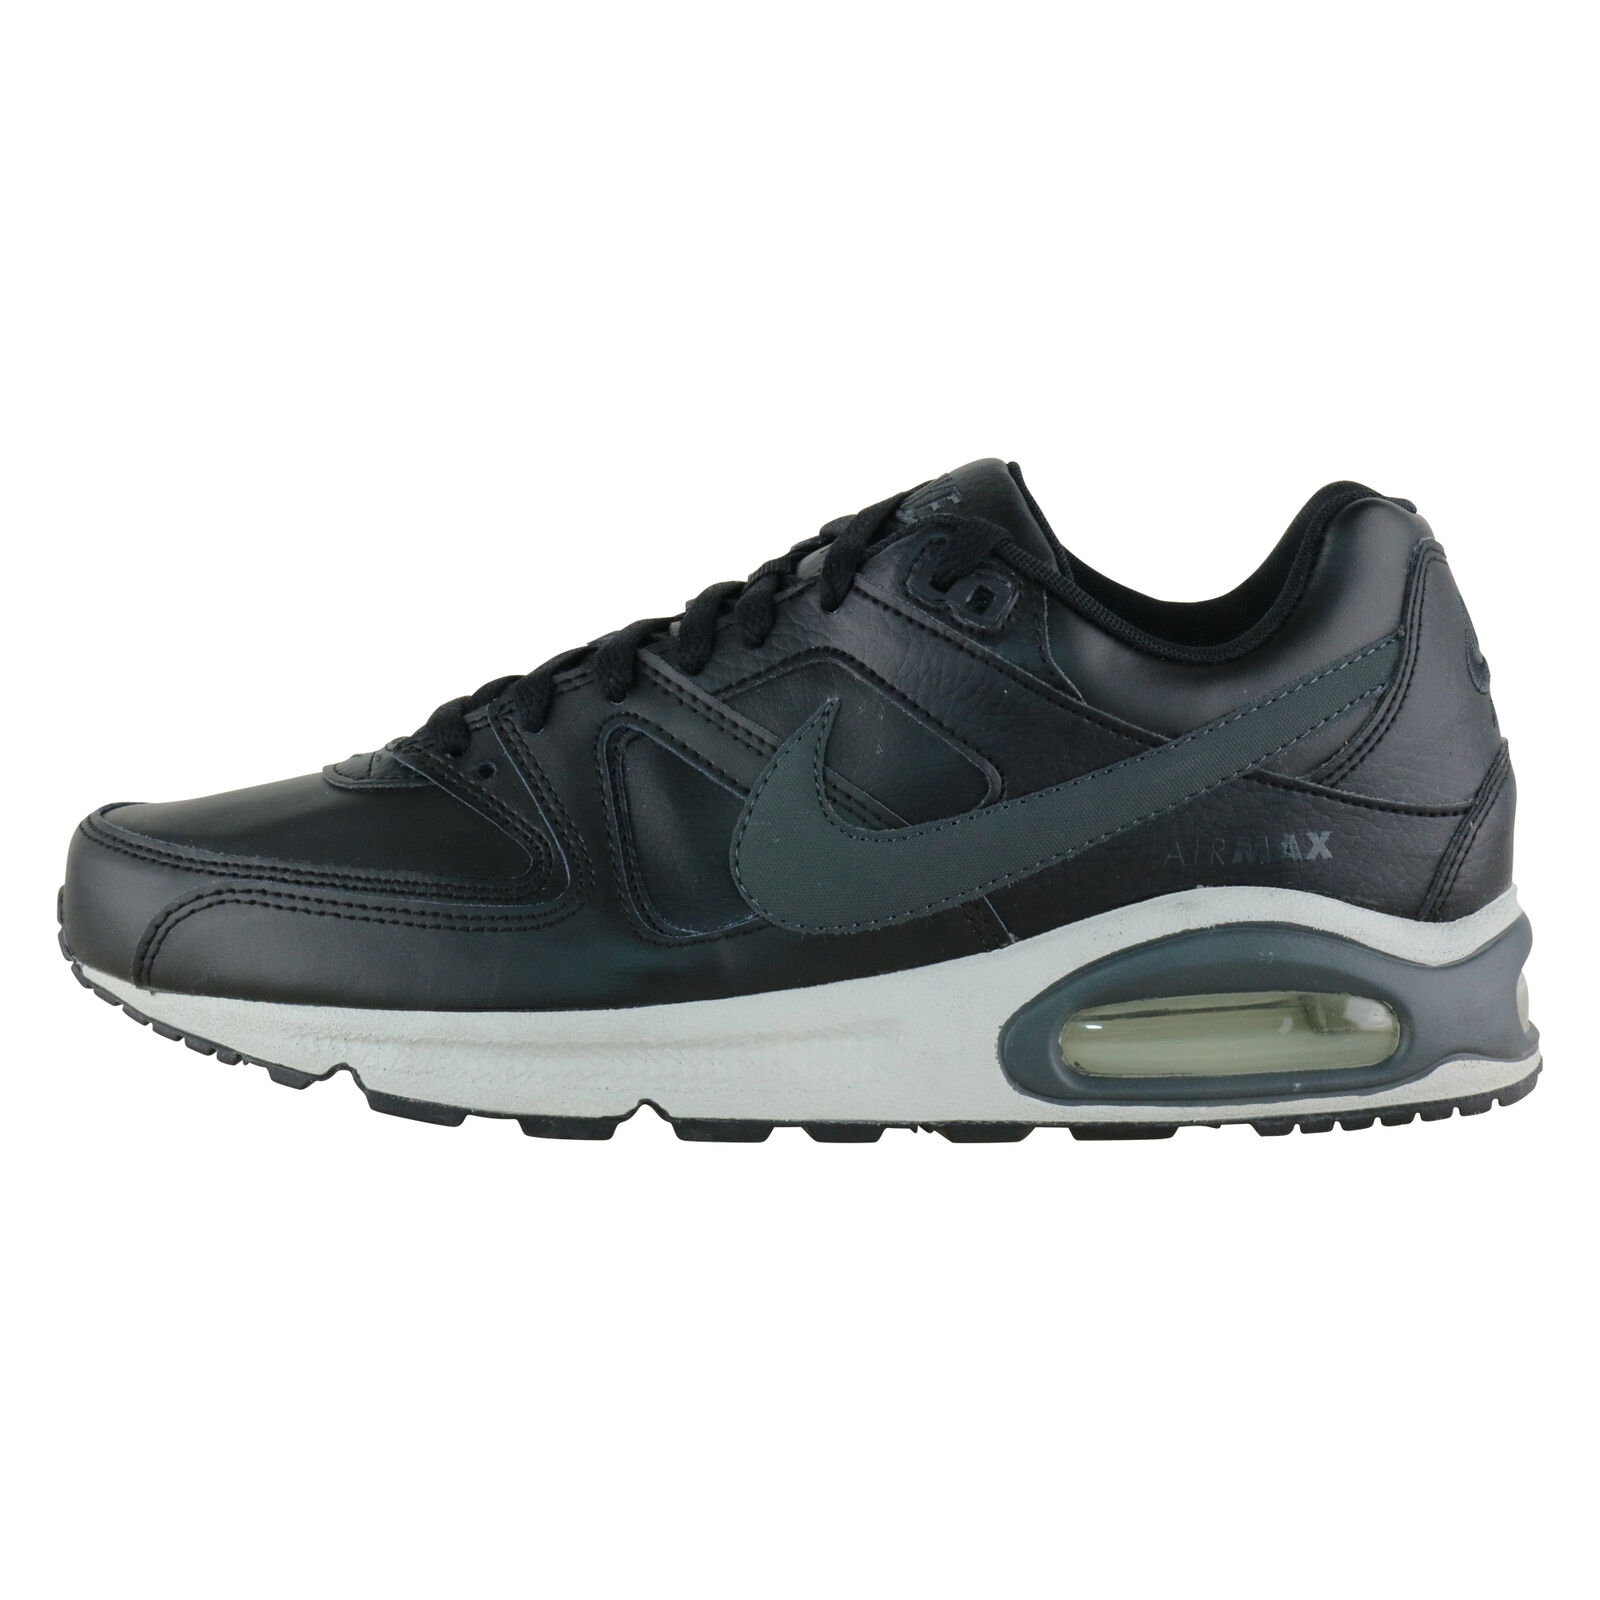 Nike Air Max Command Leather schwarz   grau grau grau 749760-001    6c137b